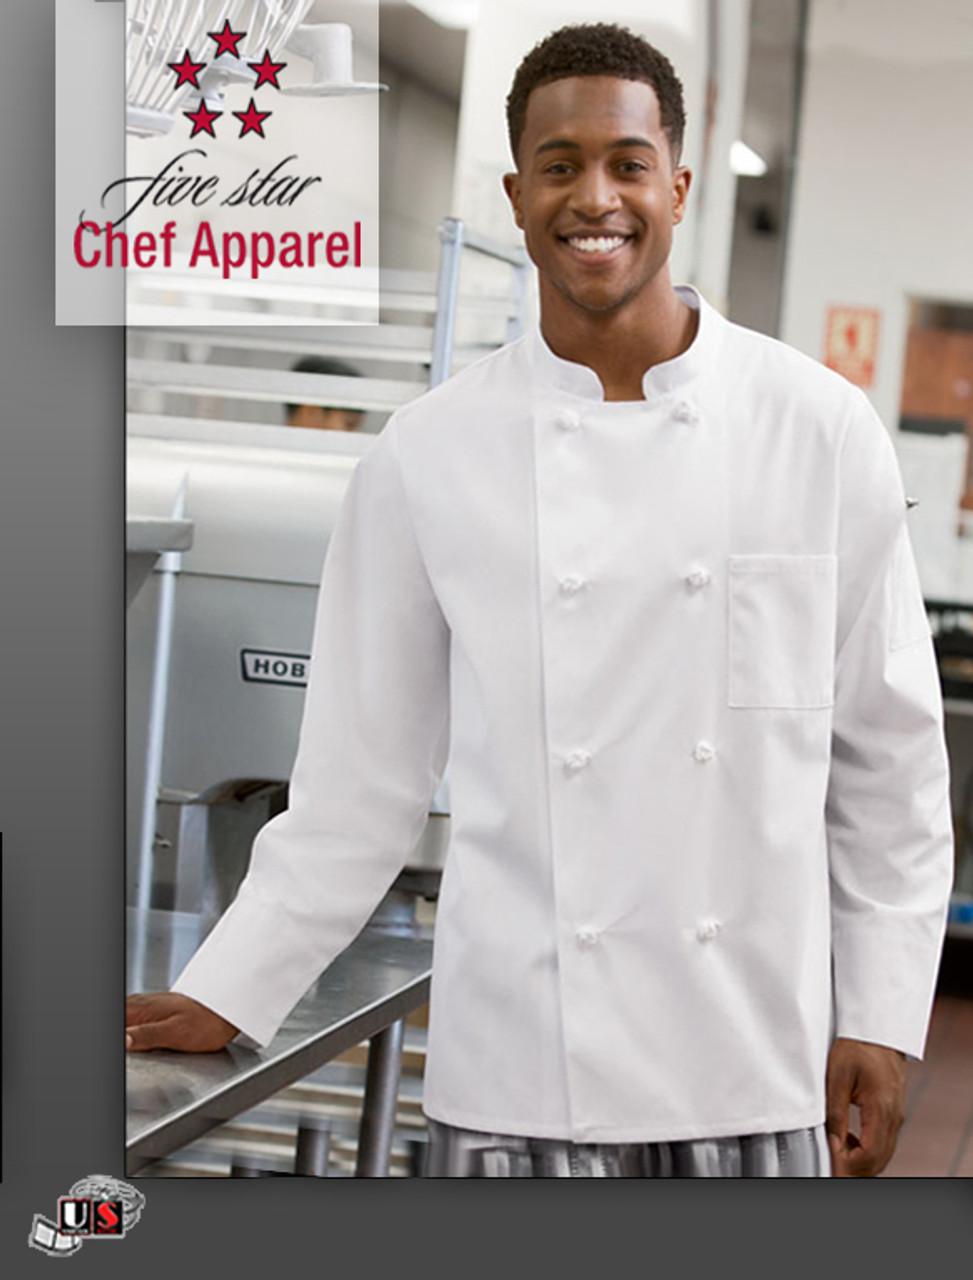 Five Star Chef Apparel Unisex Knot Button Coat